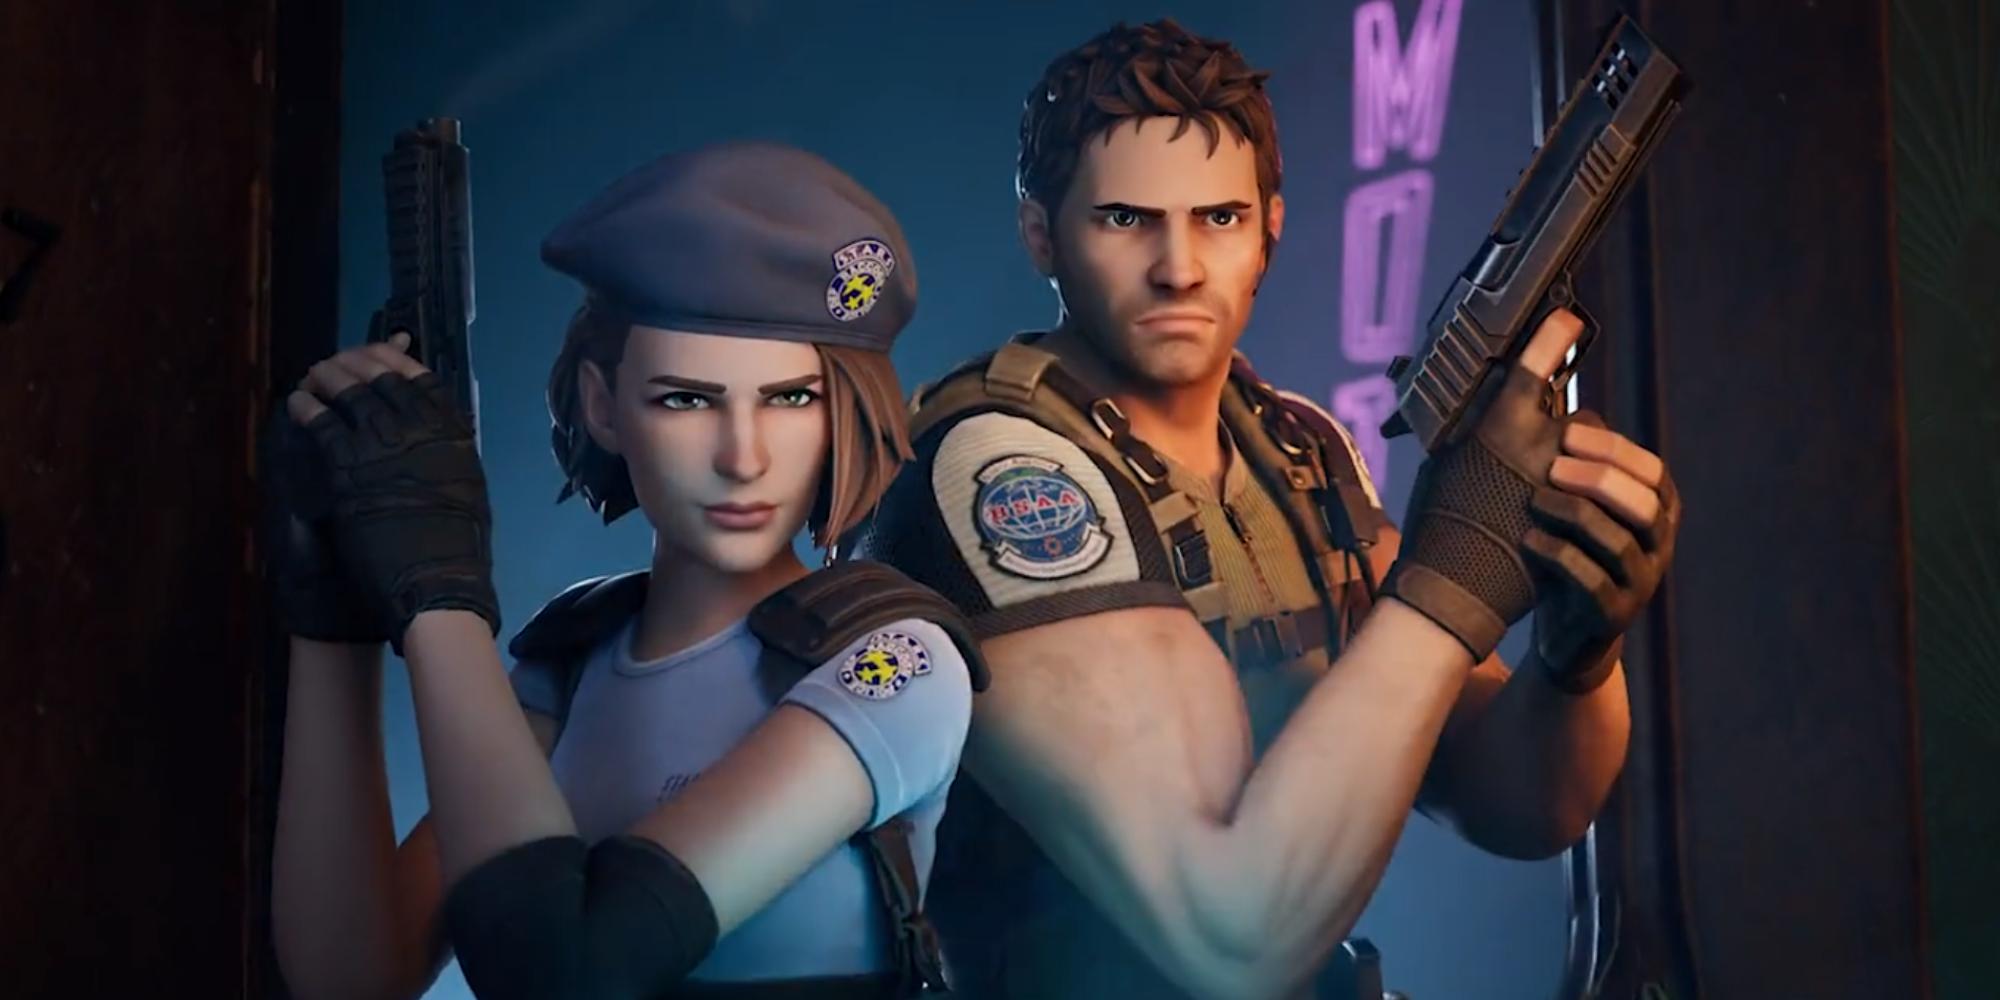 Fortnite Adds Resident Evil's Chris Redfield and Jill Valentine Skins